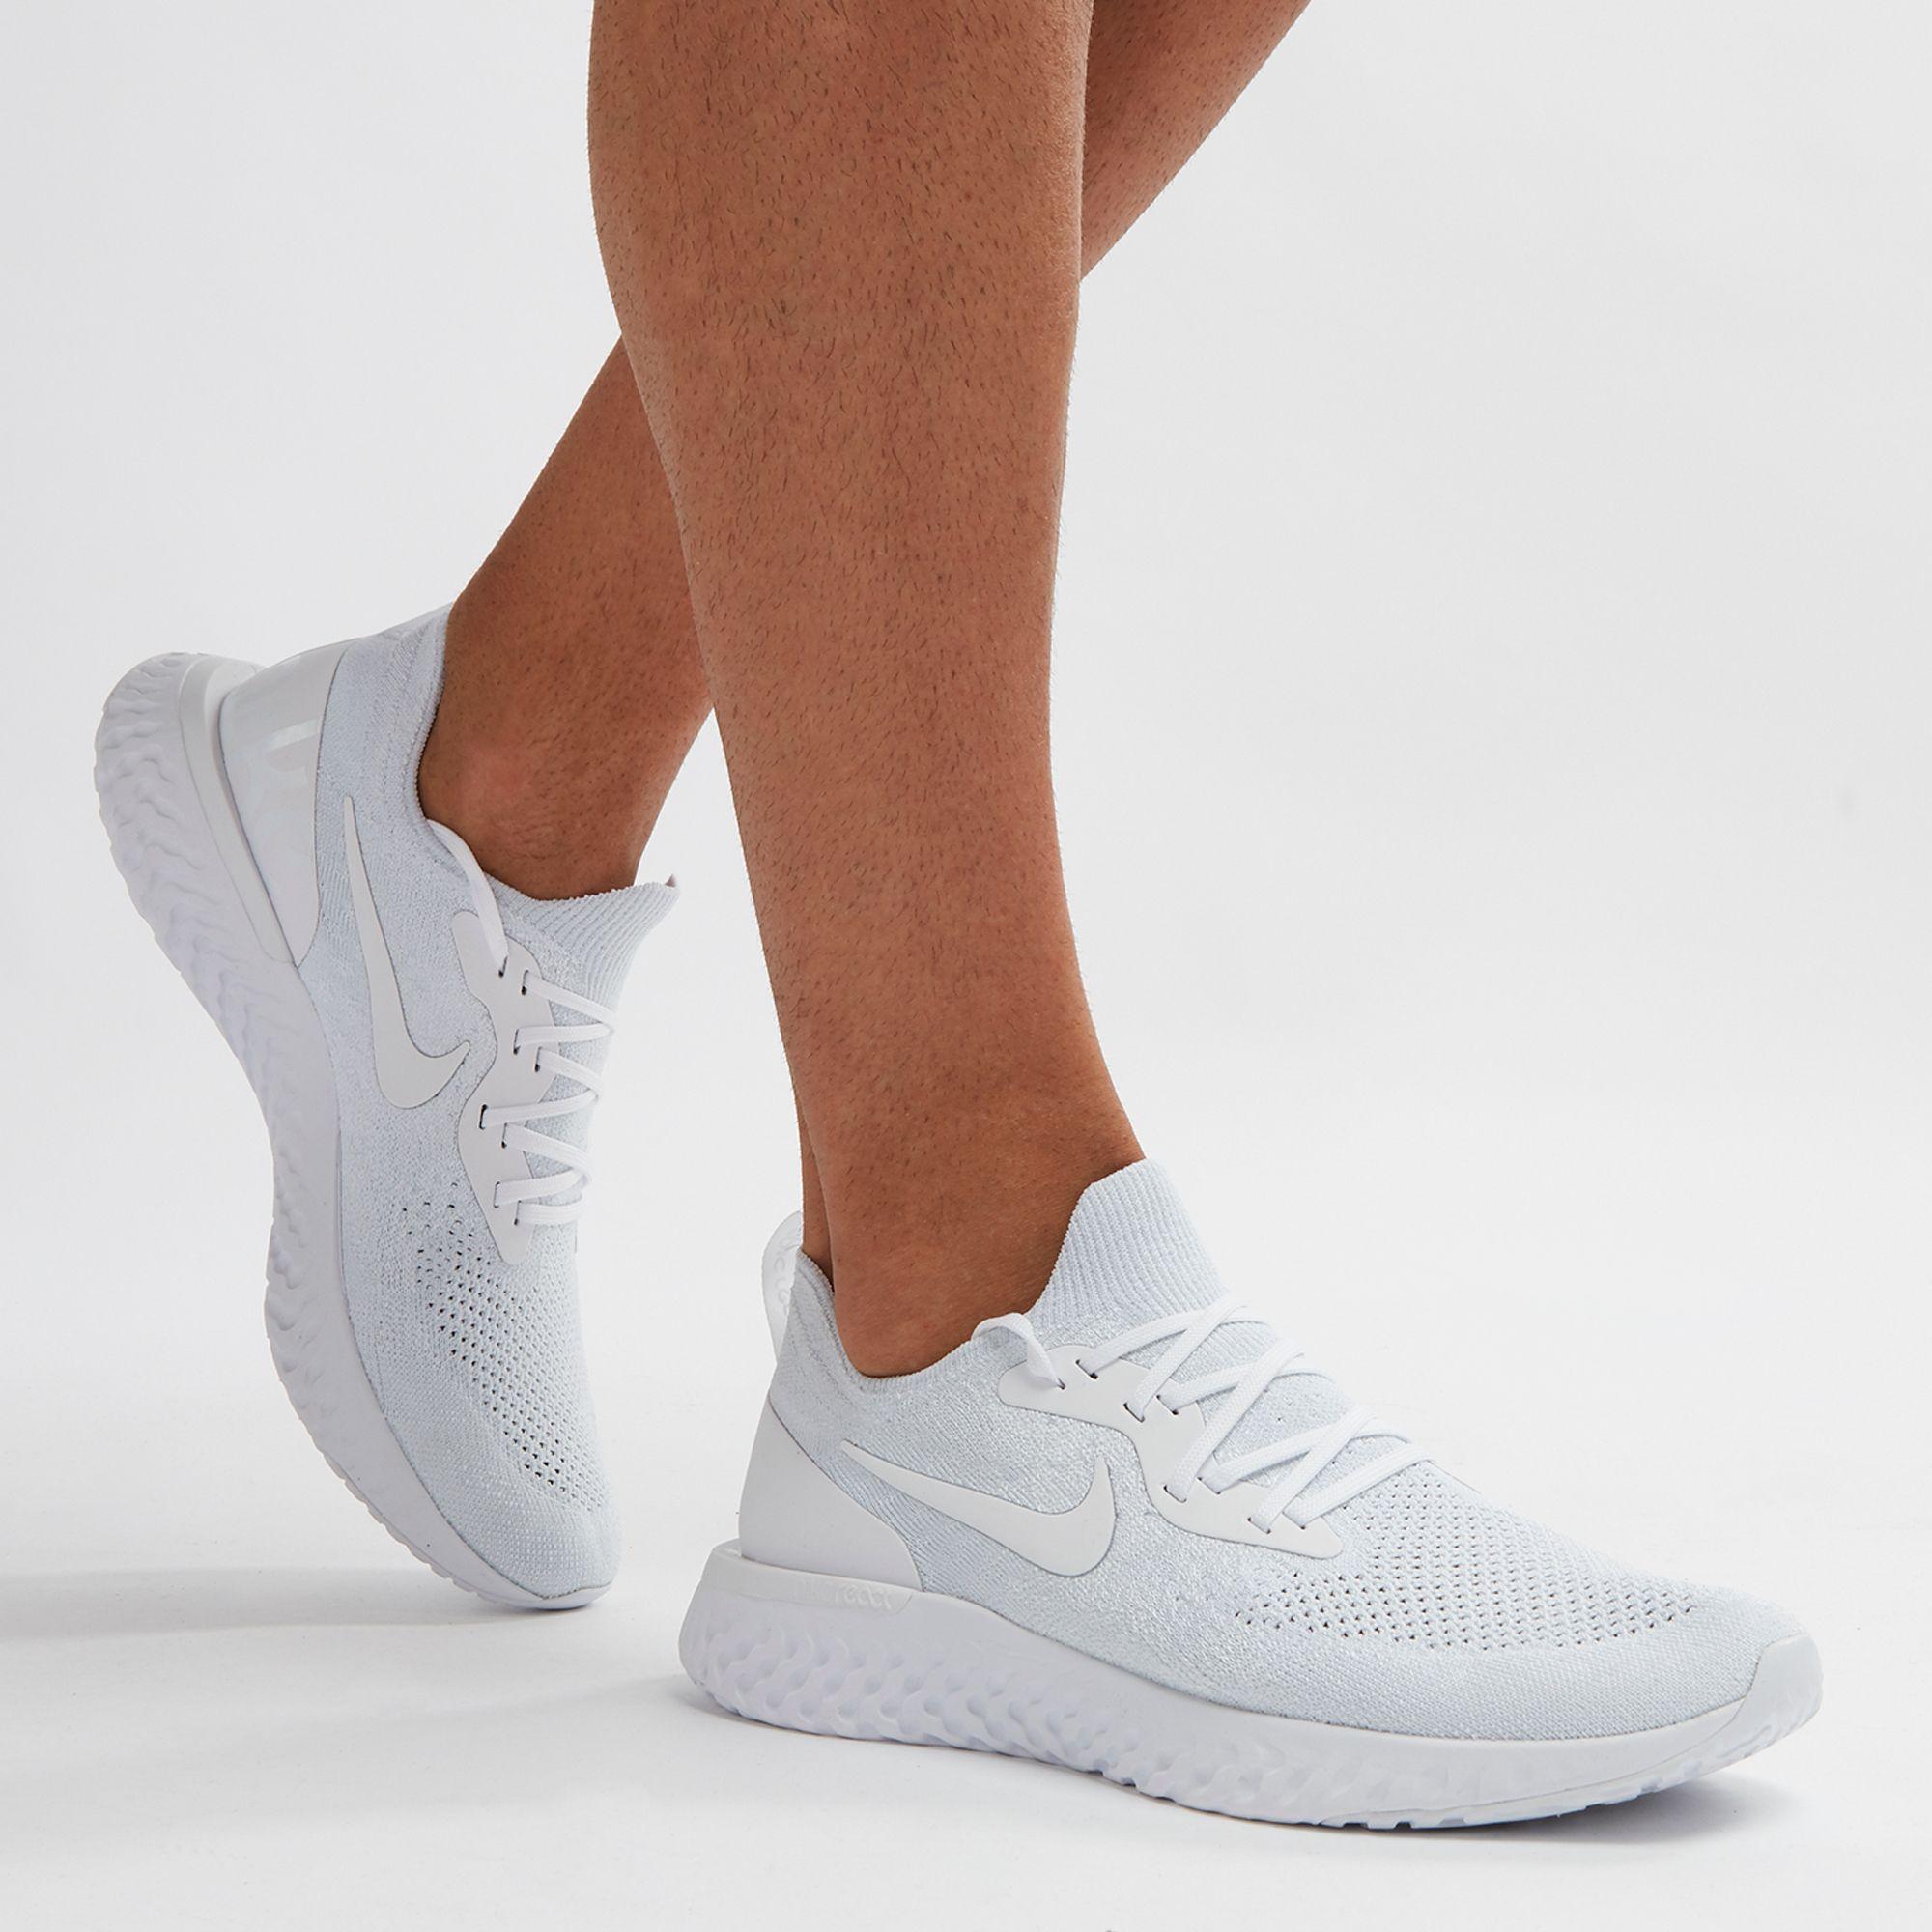 Zapatillas De Running Nike Epic Deportivo Reaccionar Flyknit Zapatillas Calzado Deportivo Epic 2ecd21